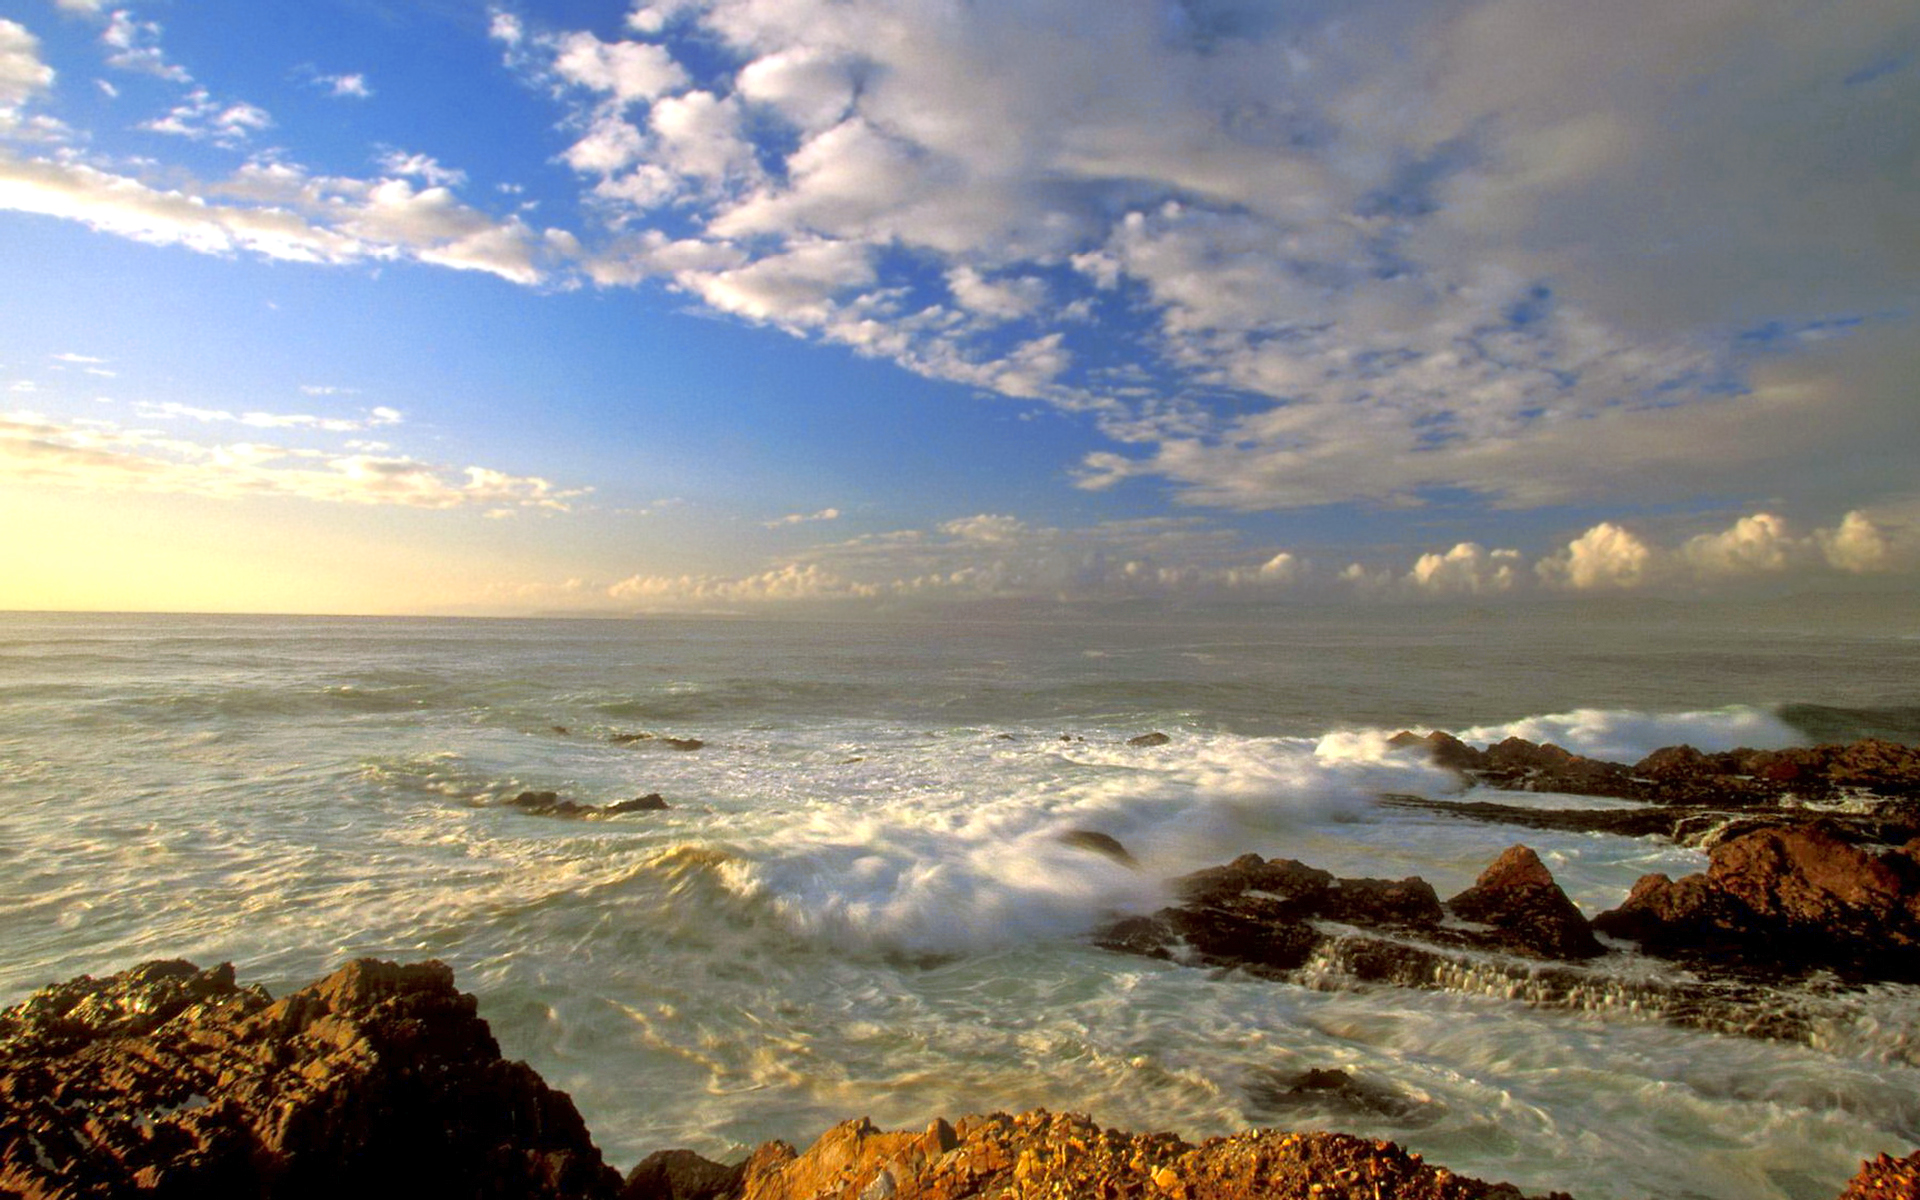 море, волны, скалы